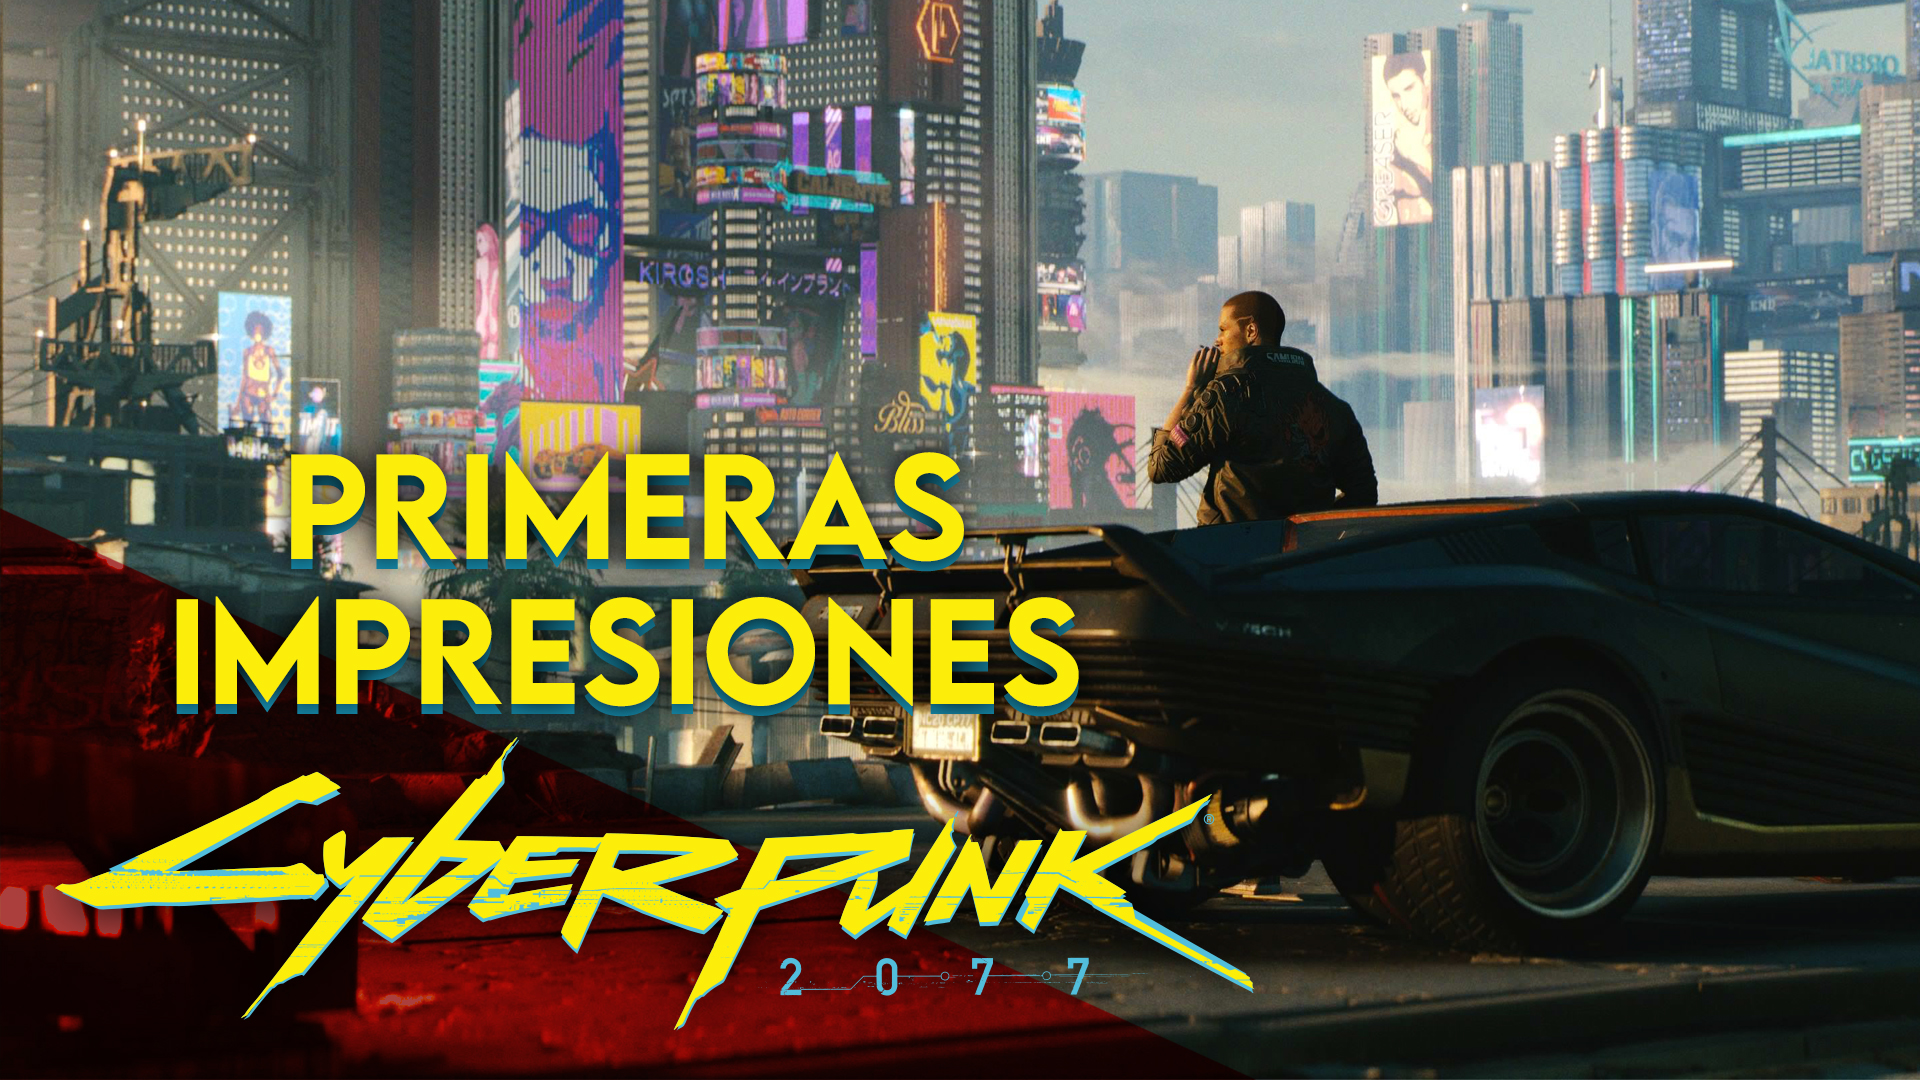 Primeras Impresiones Cyberpunk 2077